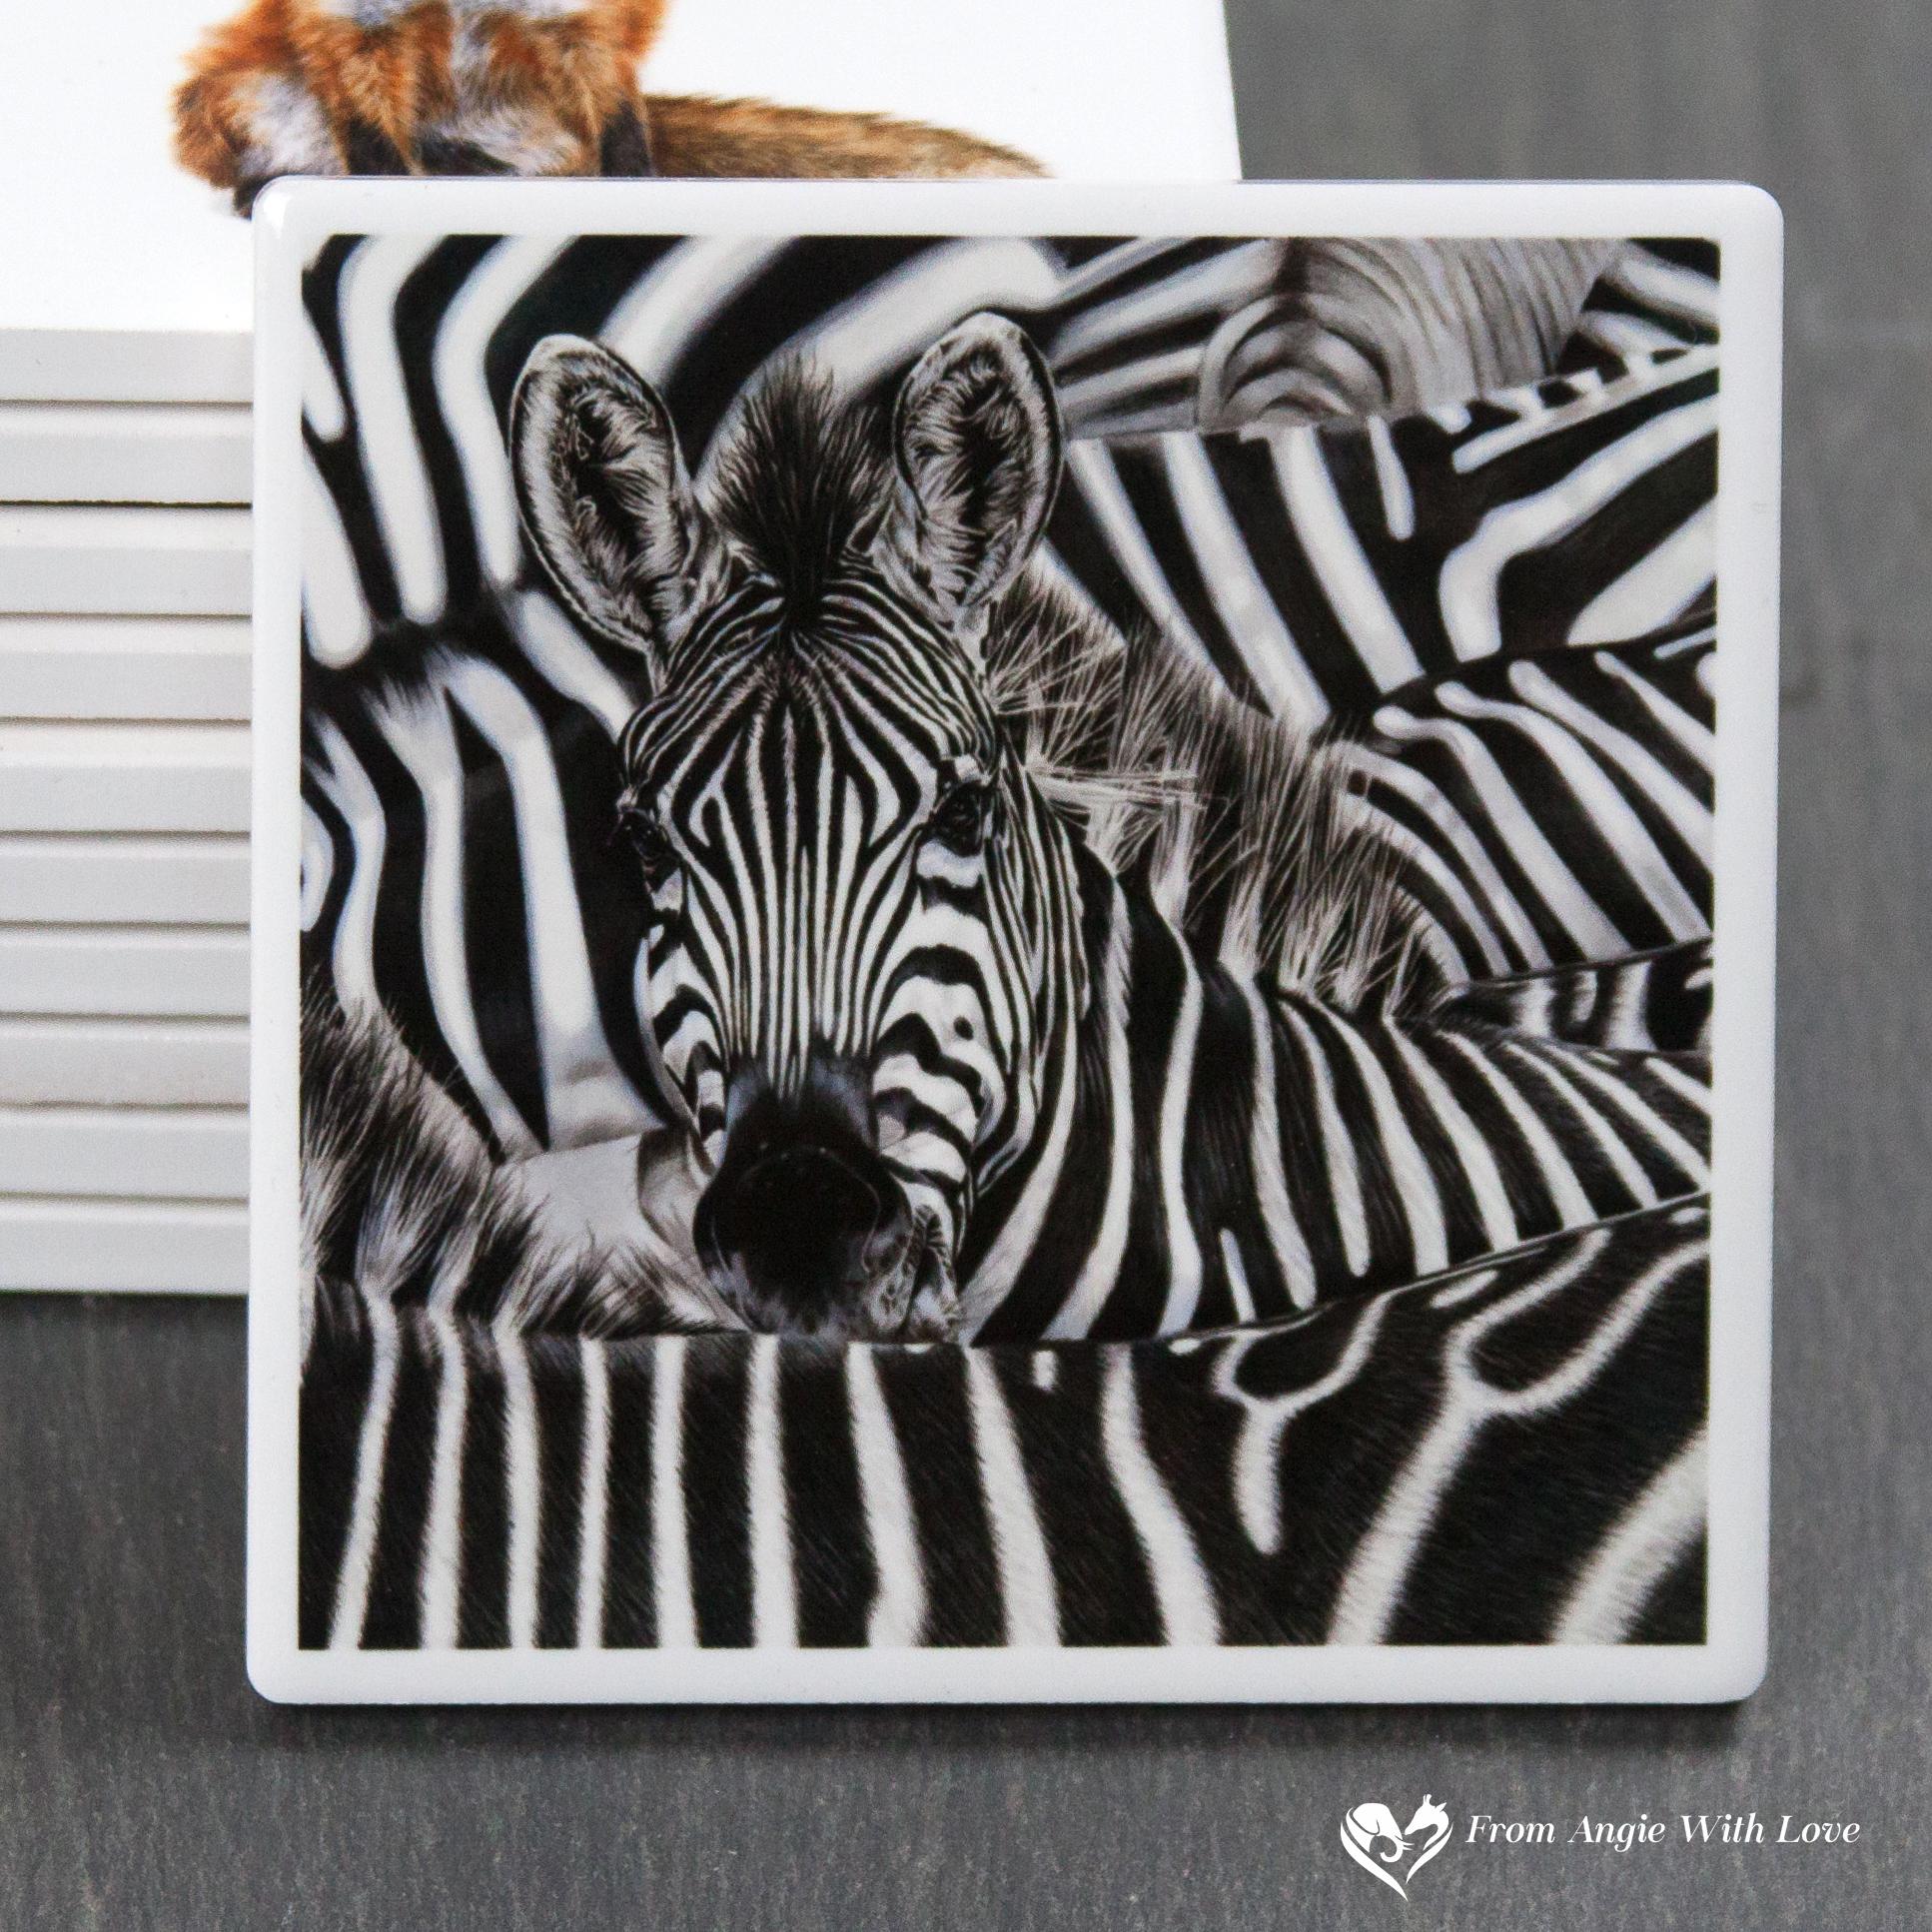 Zebra Coaster - Lost in a Crowd